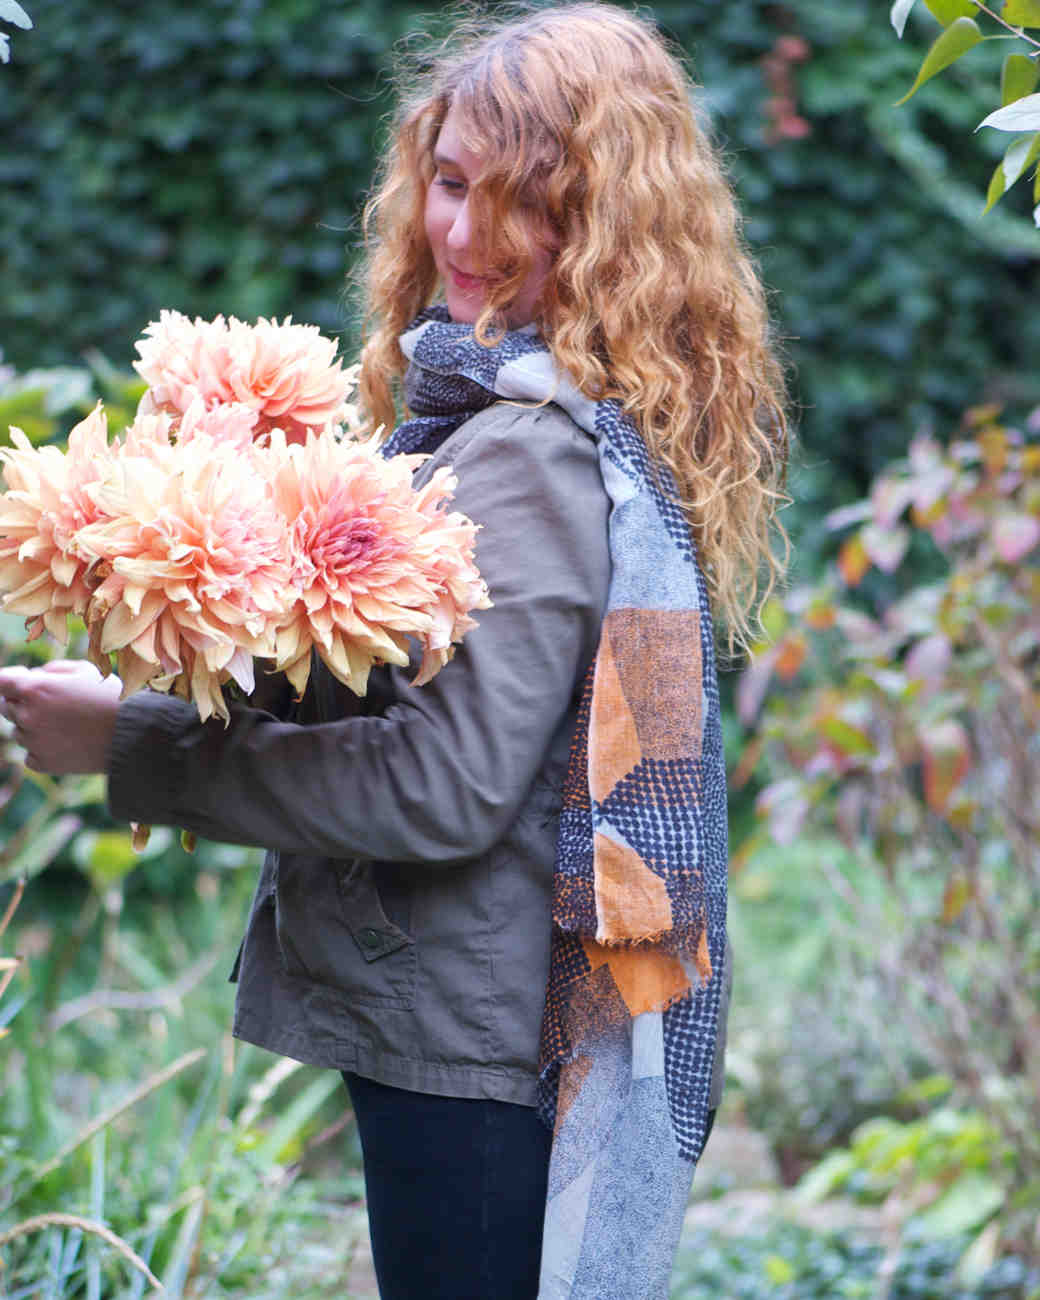 farmer-florists-nicolette-camille-1214.jpg